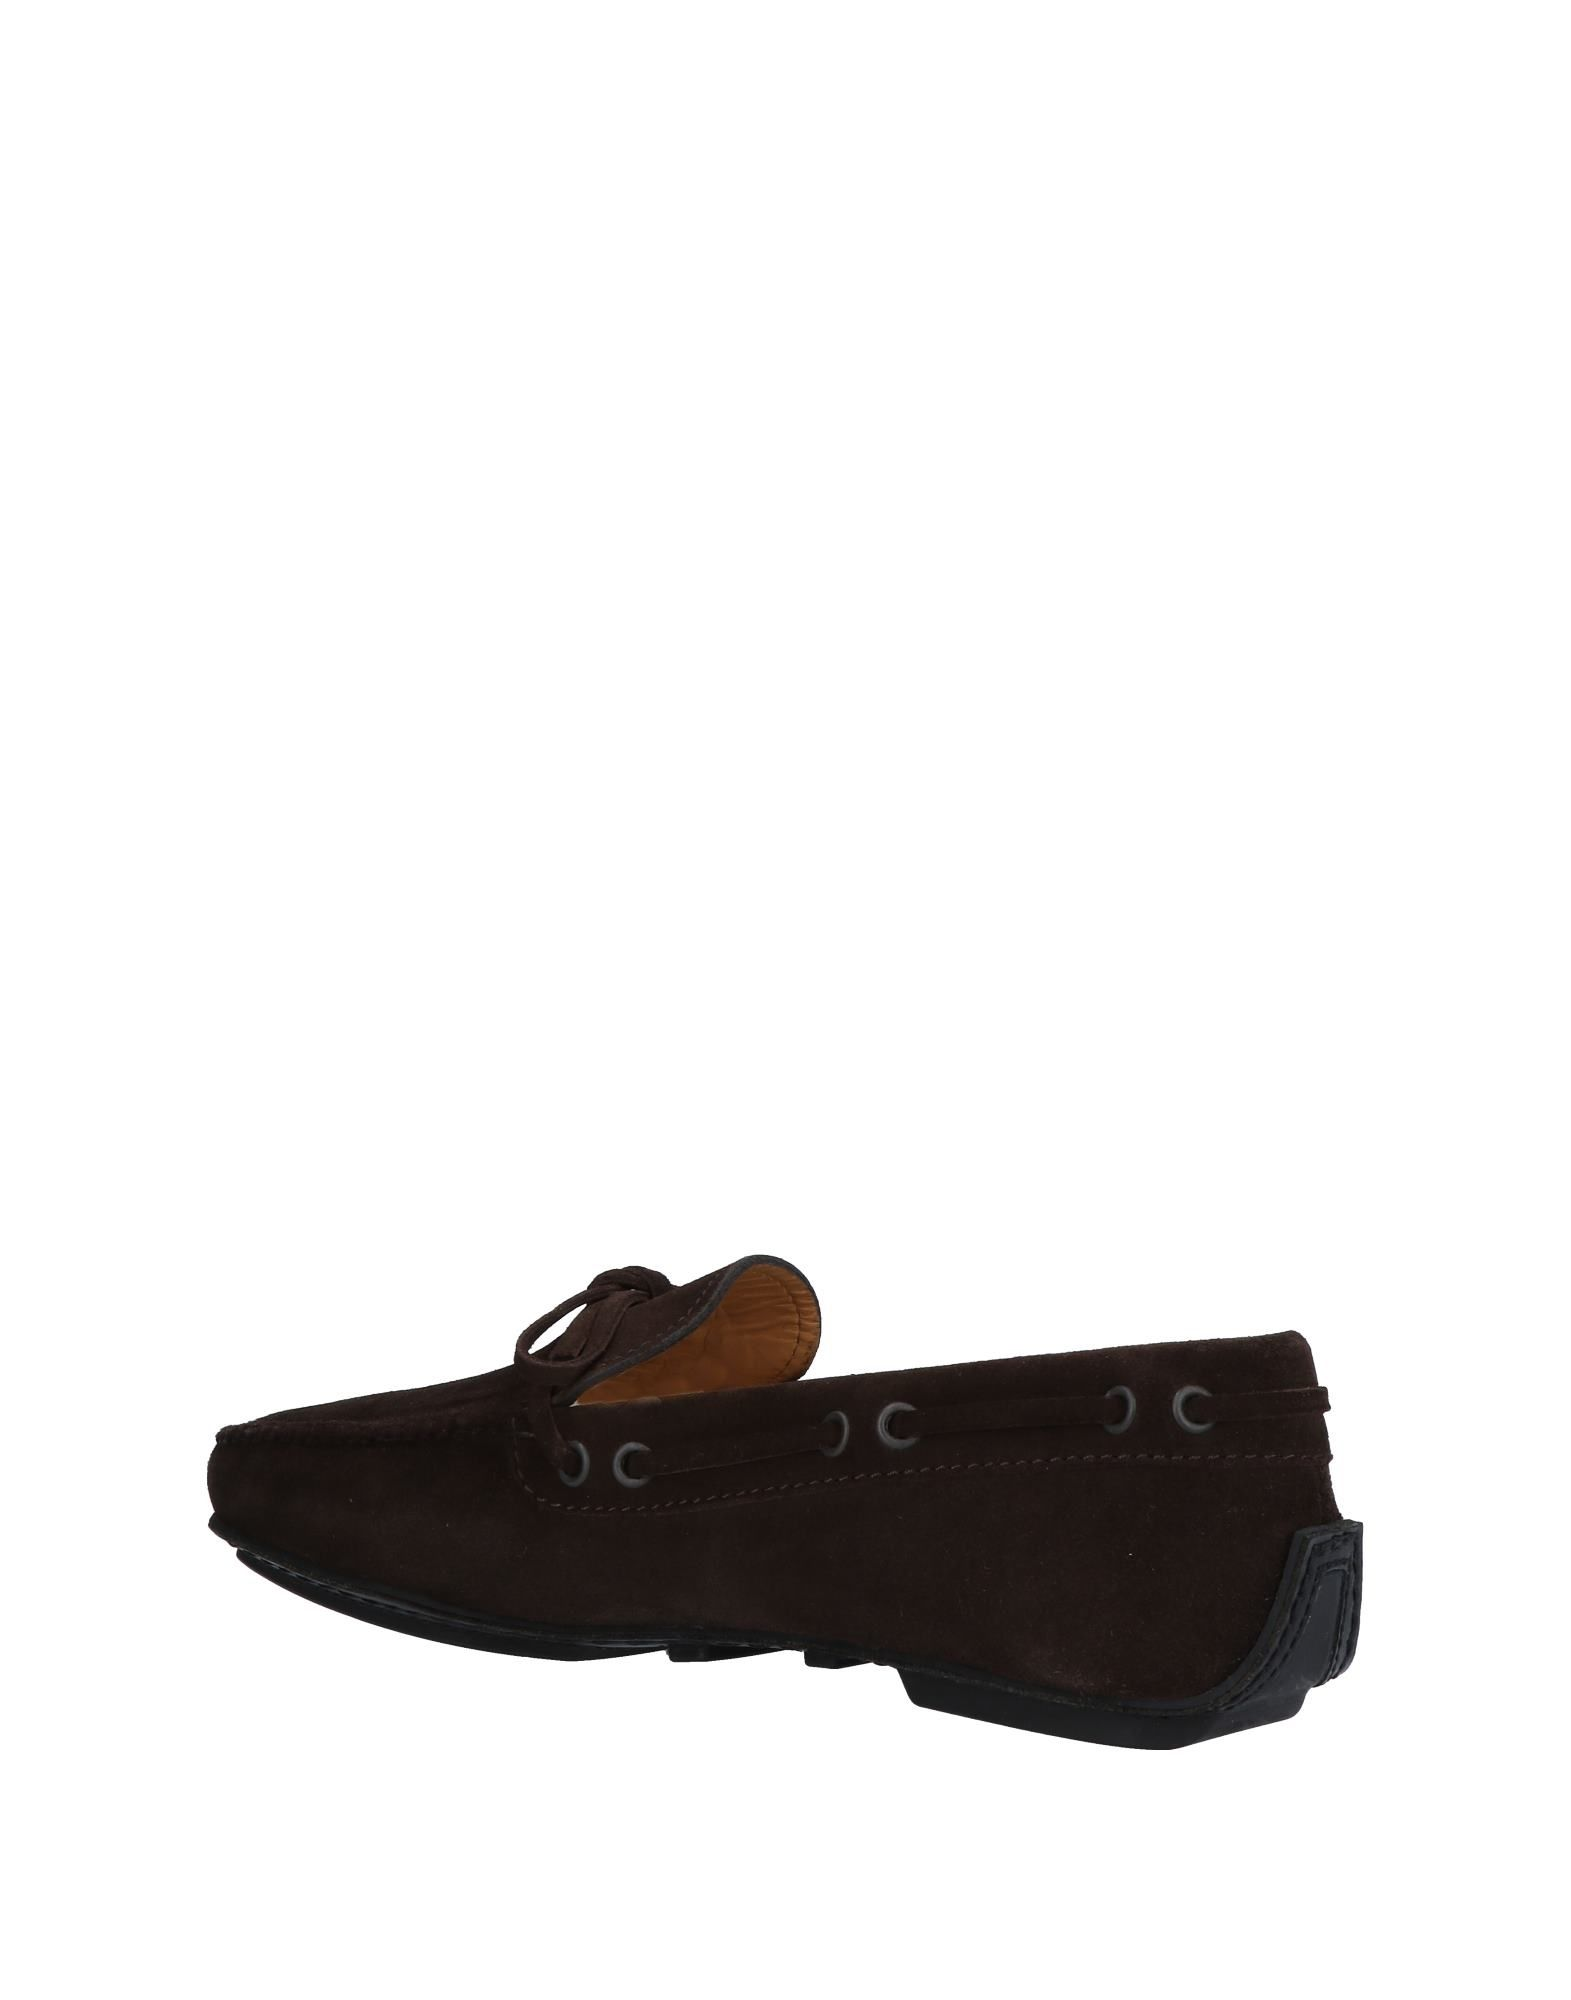 Arfango Mokassins Herren beliebte  44872177VJ Gute Qualität beliebte Herren Schuhe 8314f7